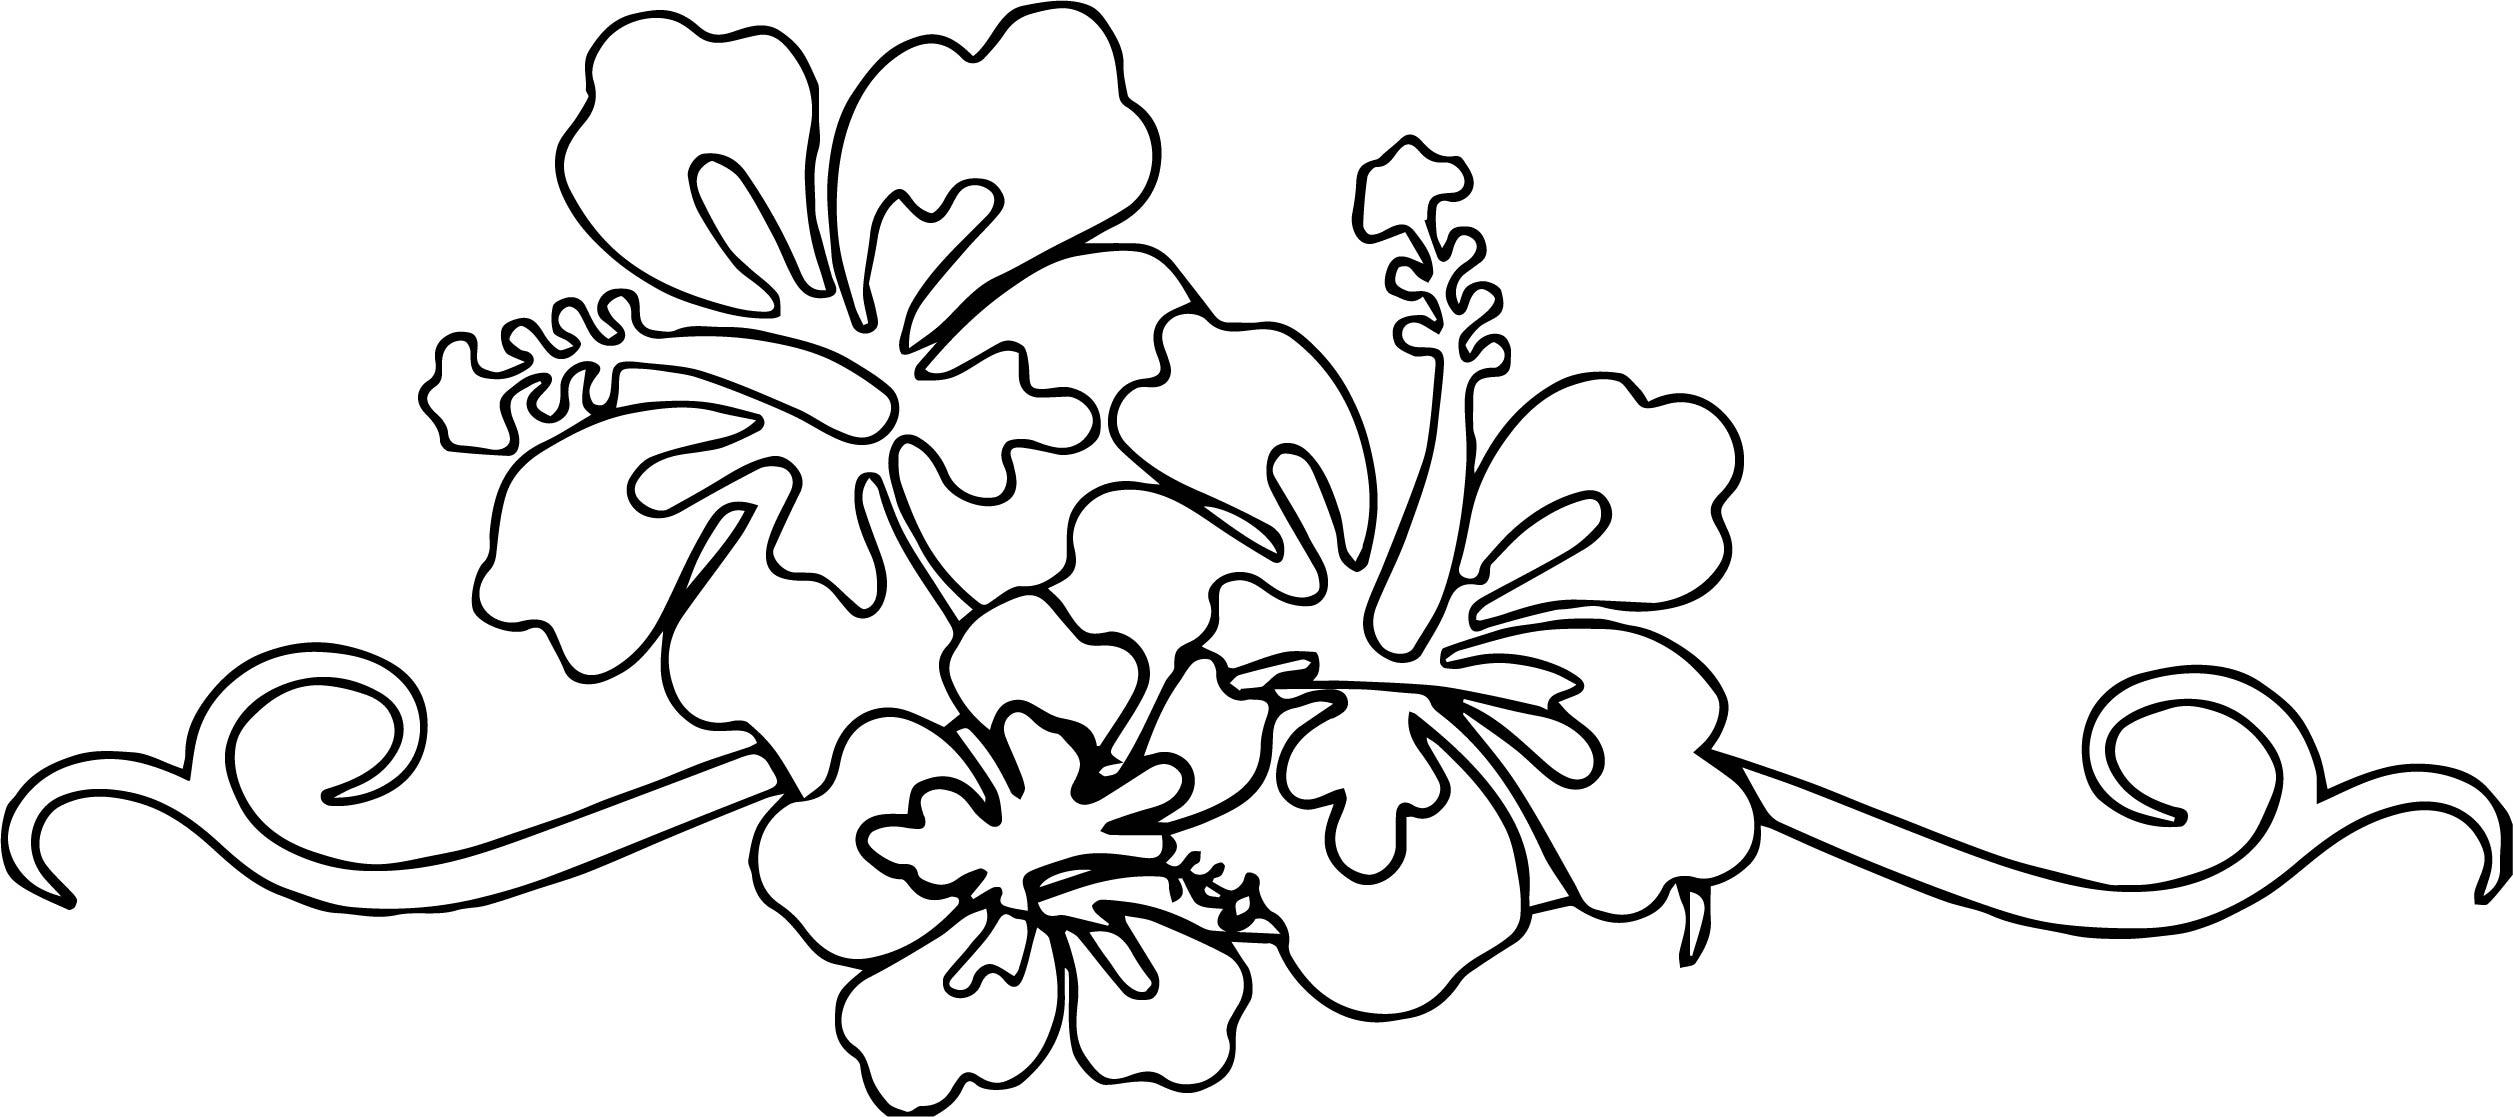 Hawaiian Flower Coloring Page WeColoringPage 08